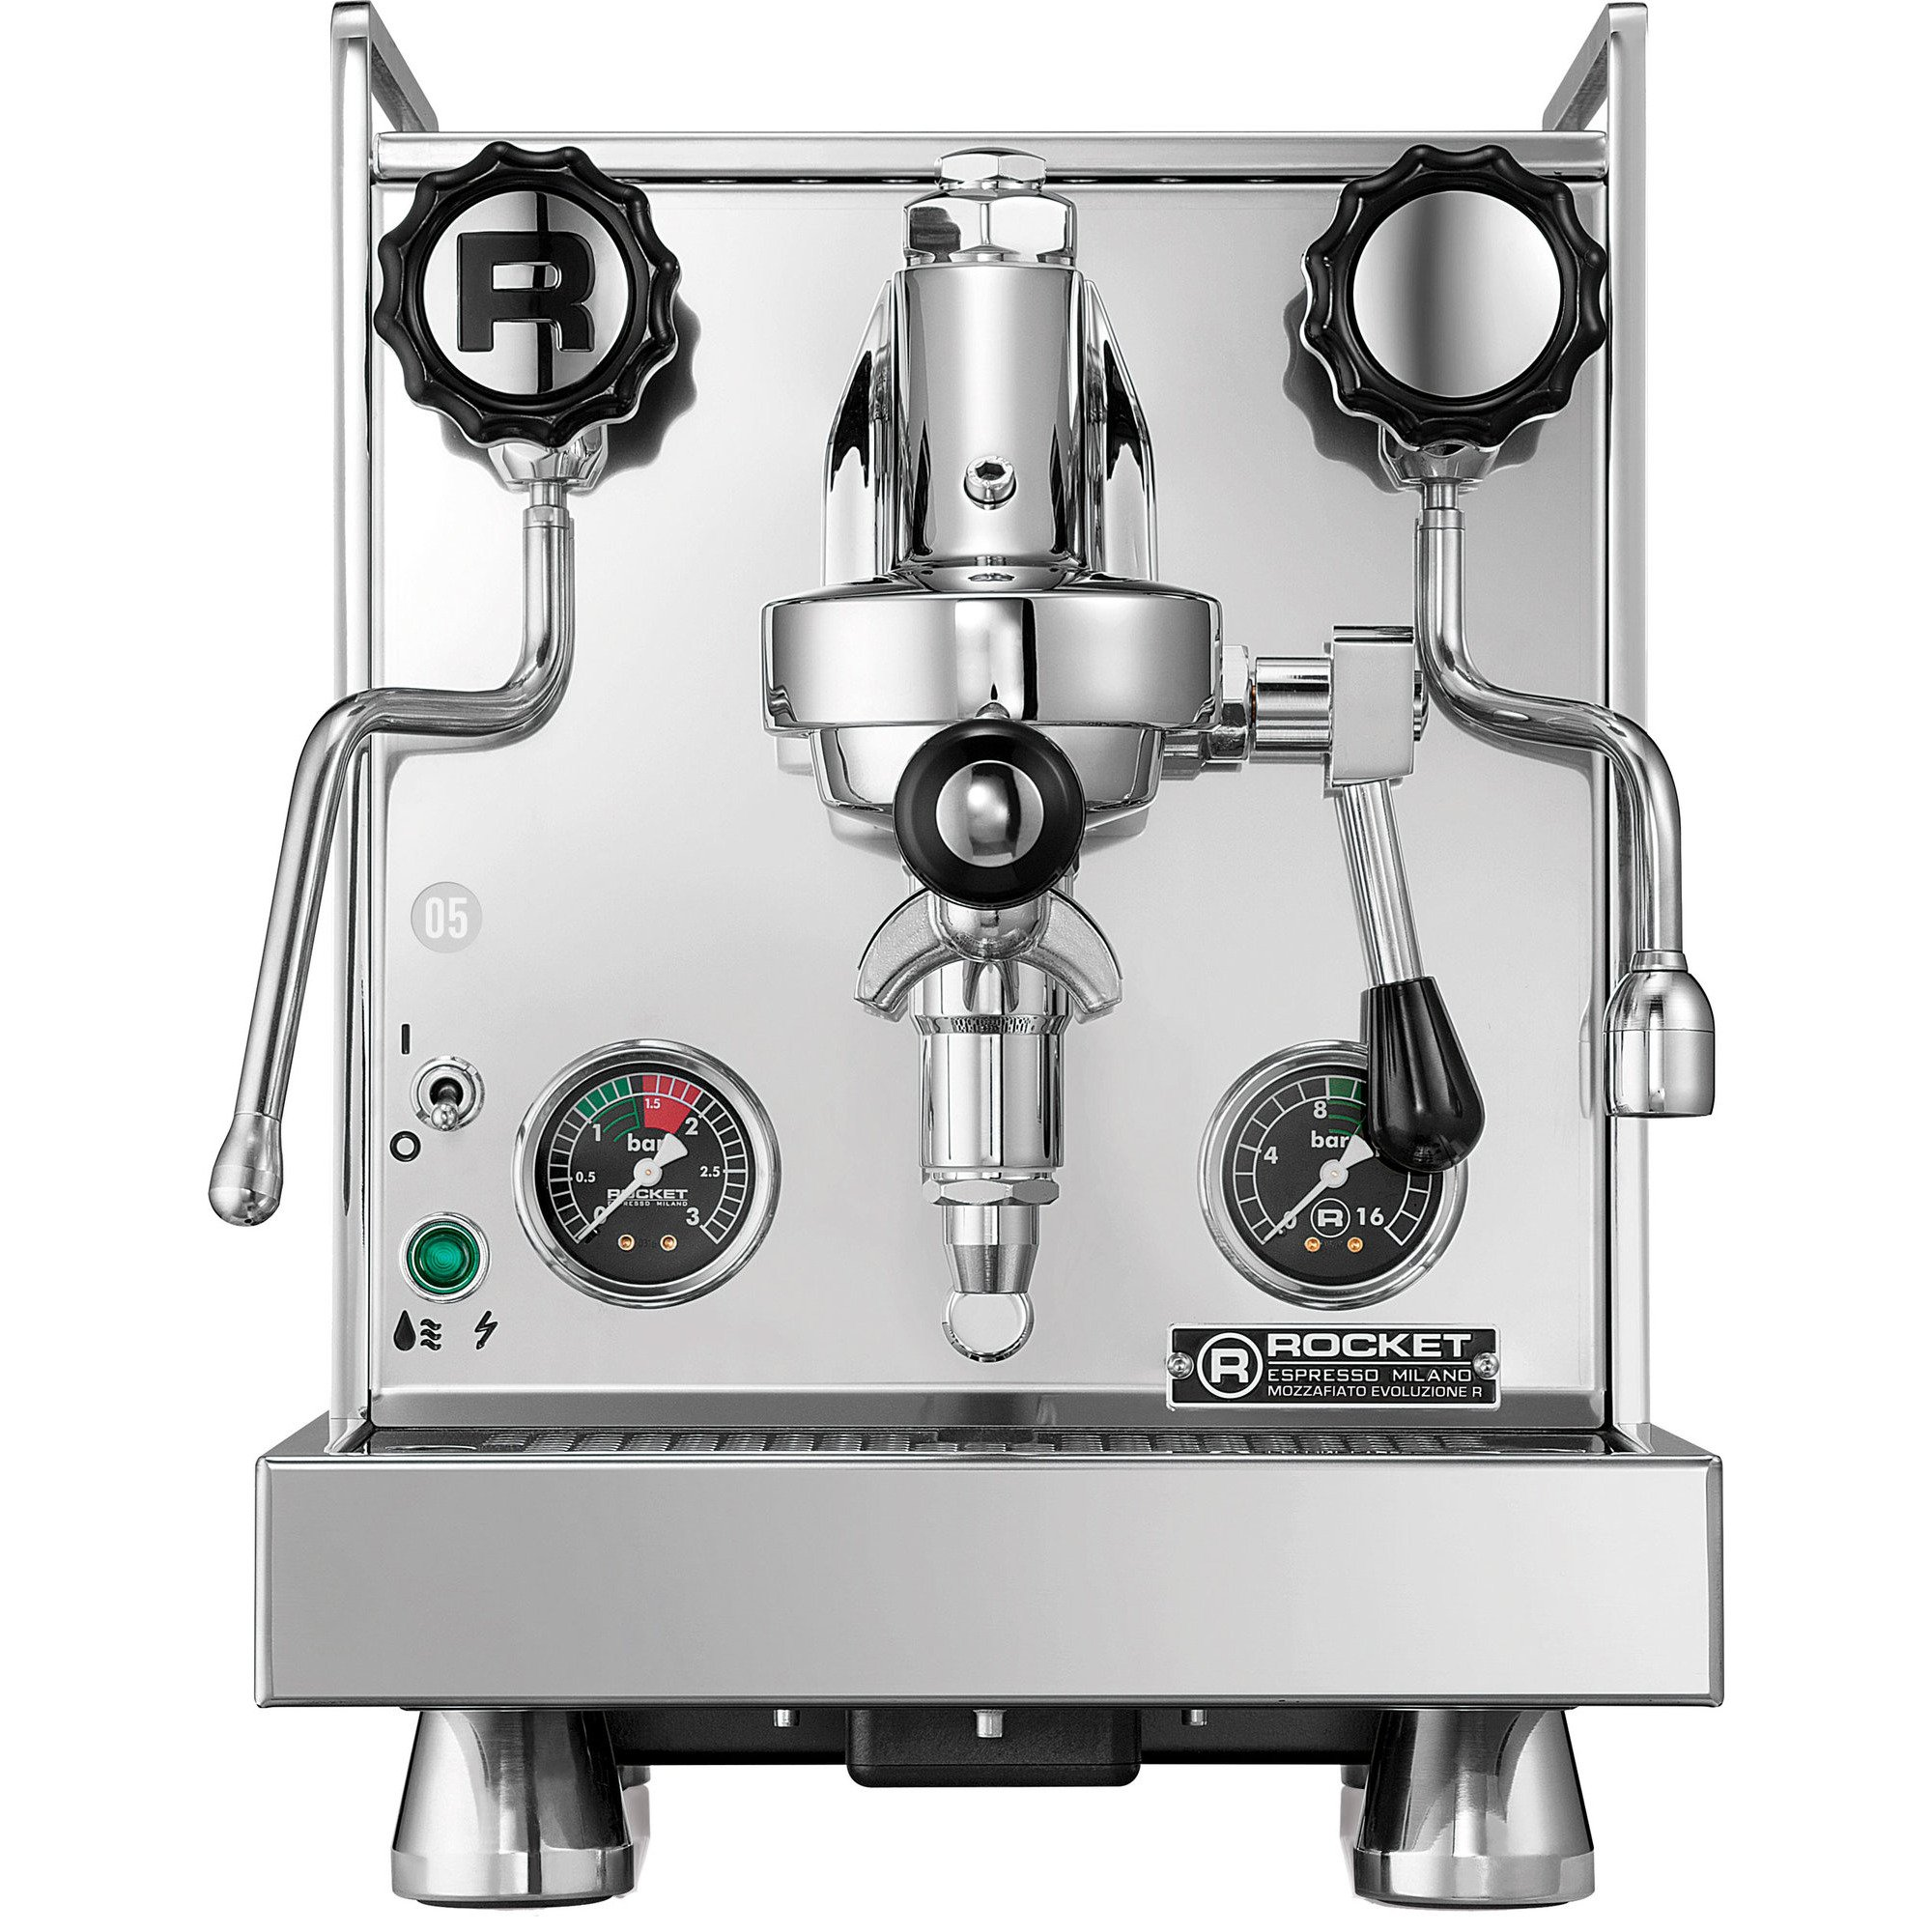 Rocket Mozzafiato Cronometro R Espressomaskin Stål